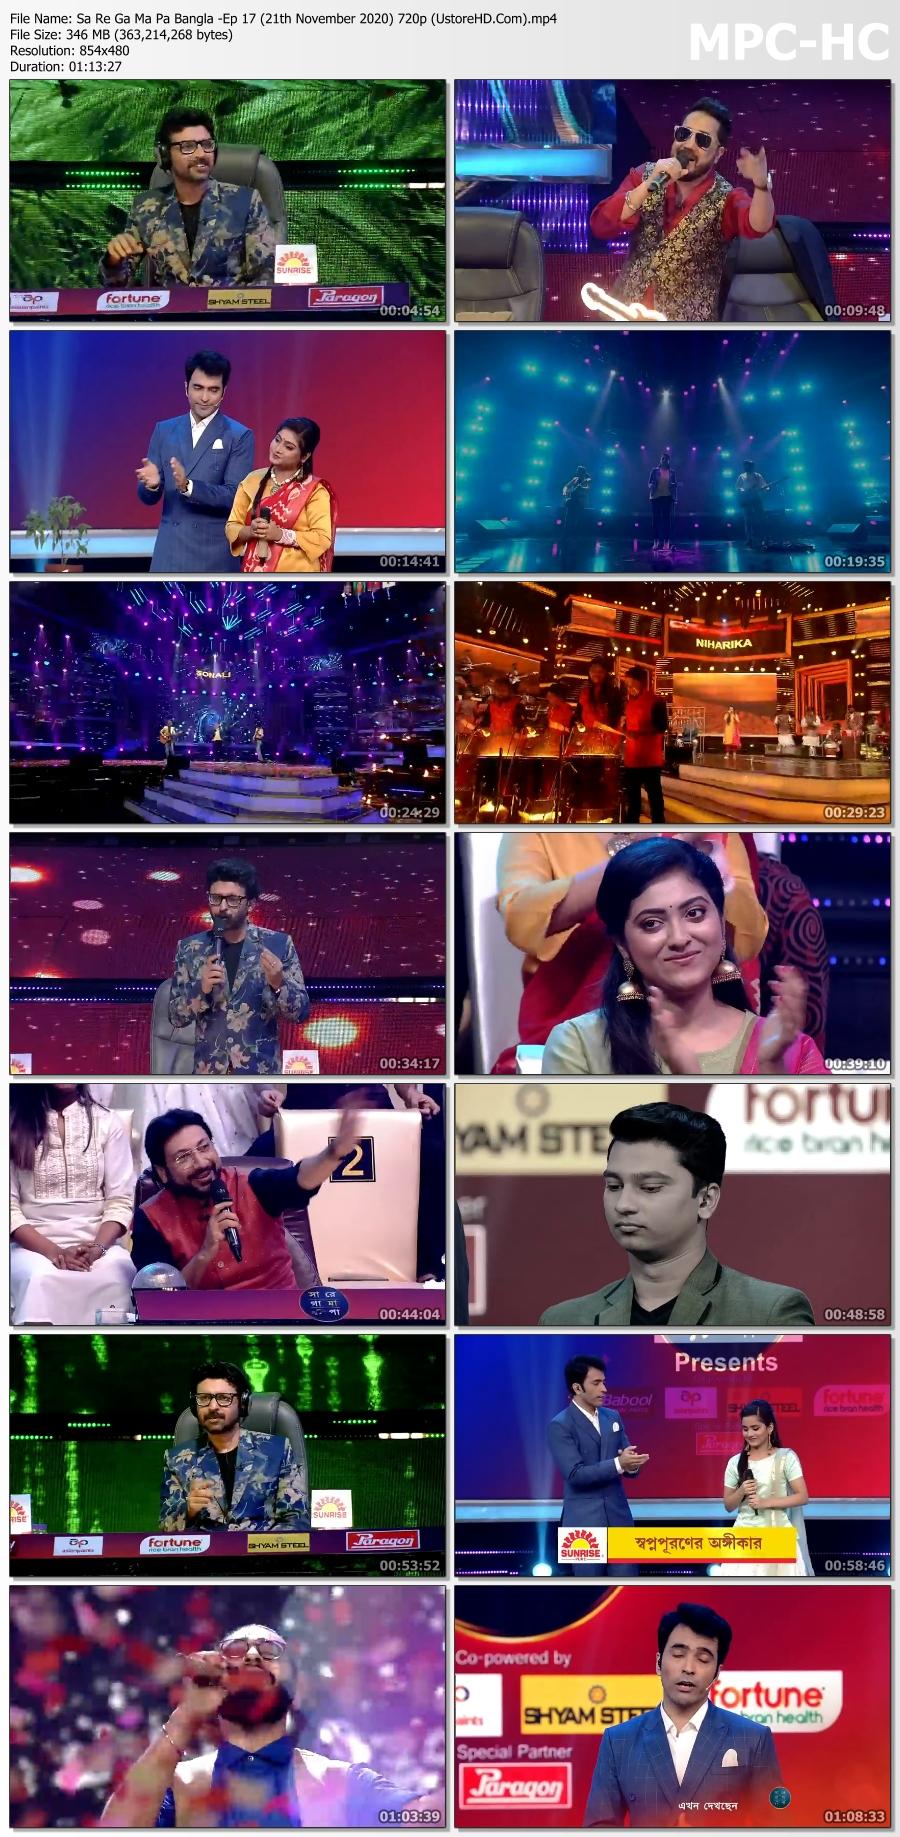 Sa-Re-Ga-Ma-Pa-Bangla-Ep-17-21th-November-2020-720p-Ustore-HD-Com-mp4-thumbs